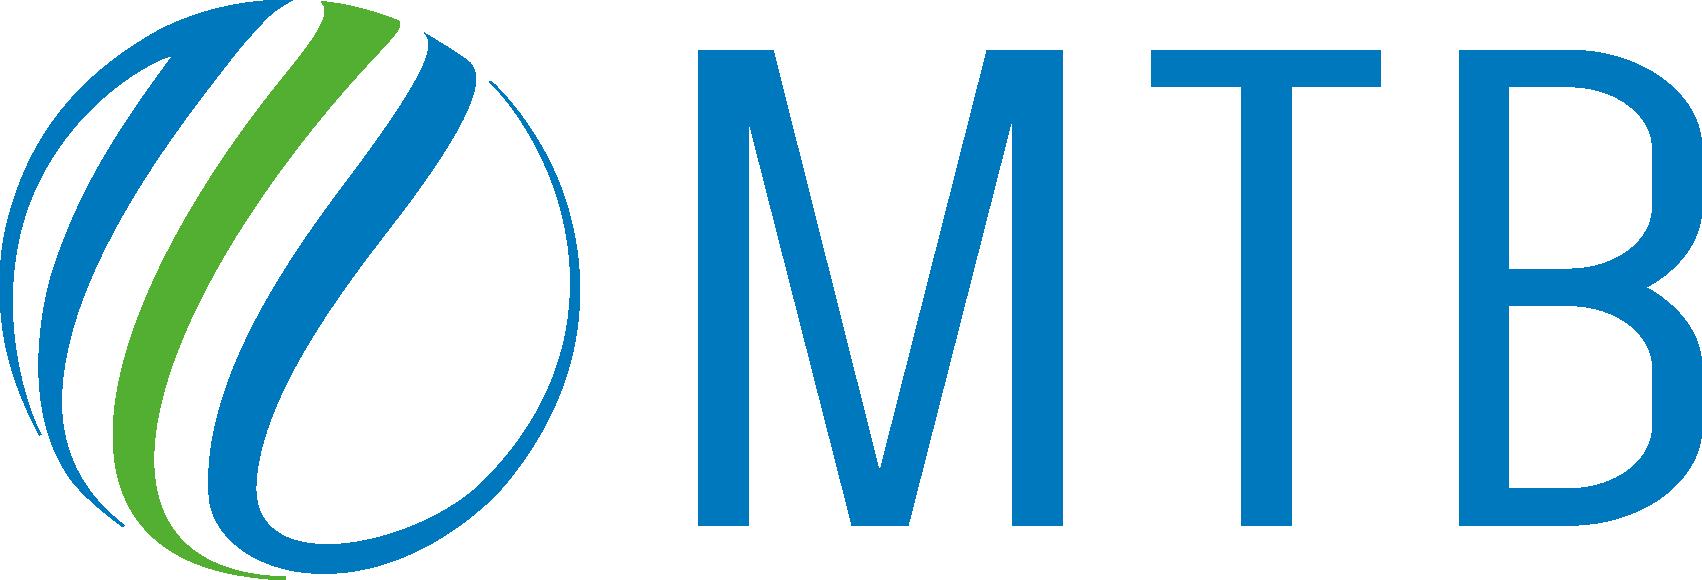 Bankas logotips (īss, zils)